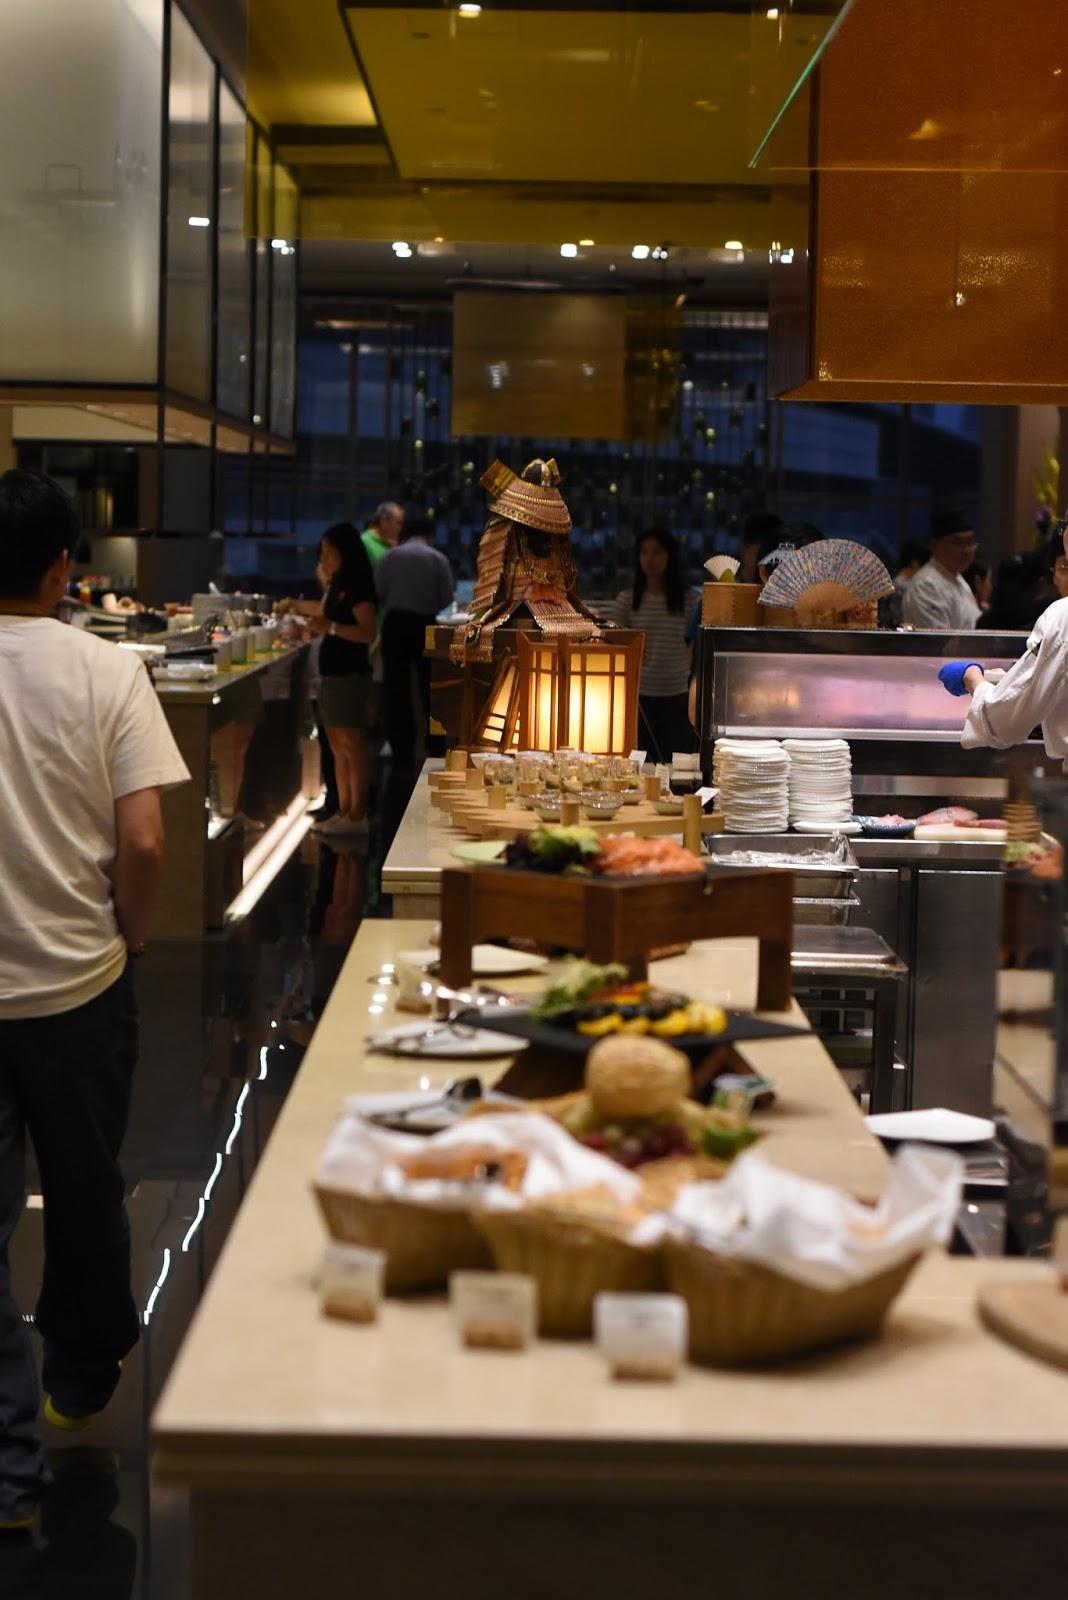 [薈景 Congress Plus] 牛牛海景自助餐 - 非常食樂主義 Chikpi's EatEatShare